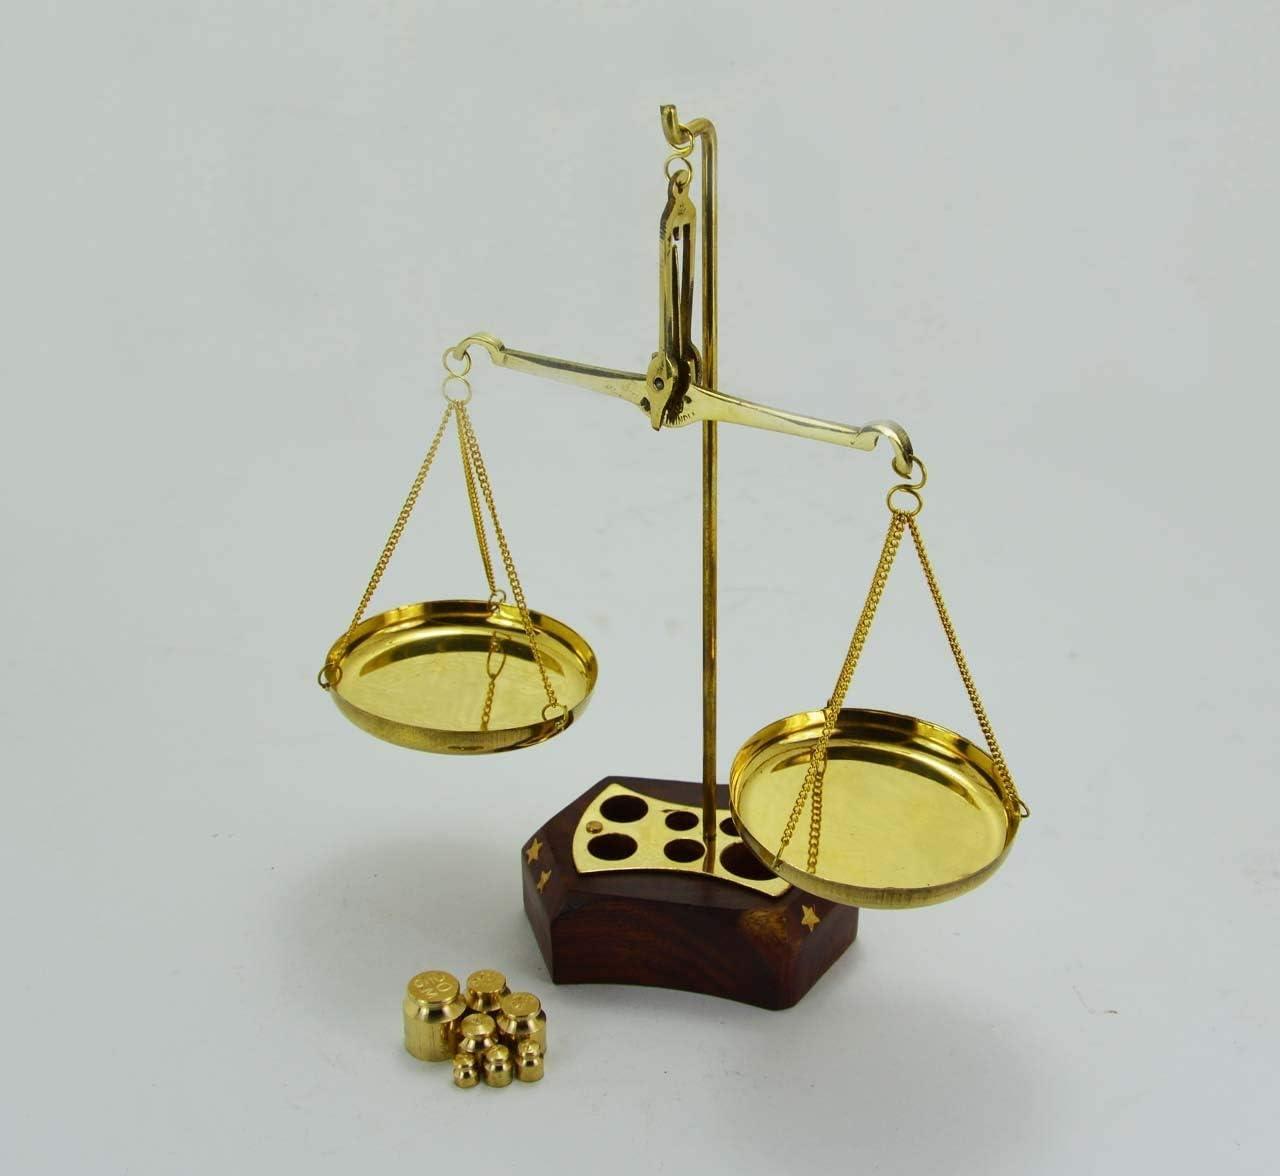 Hermosa báscula de latón para decoración de balanza de justicia: Amazon.es: Hogar